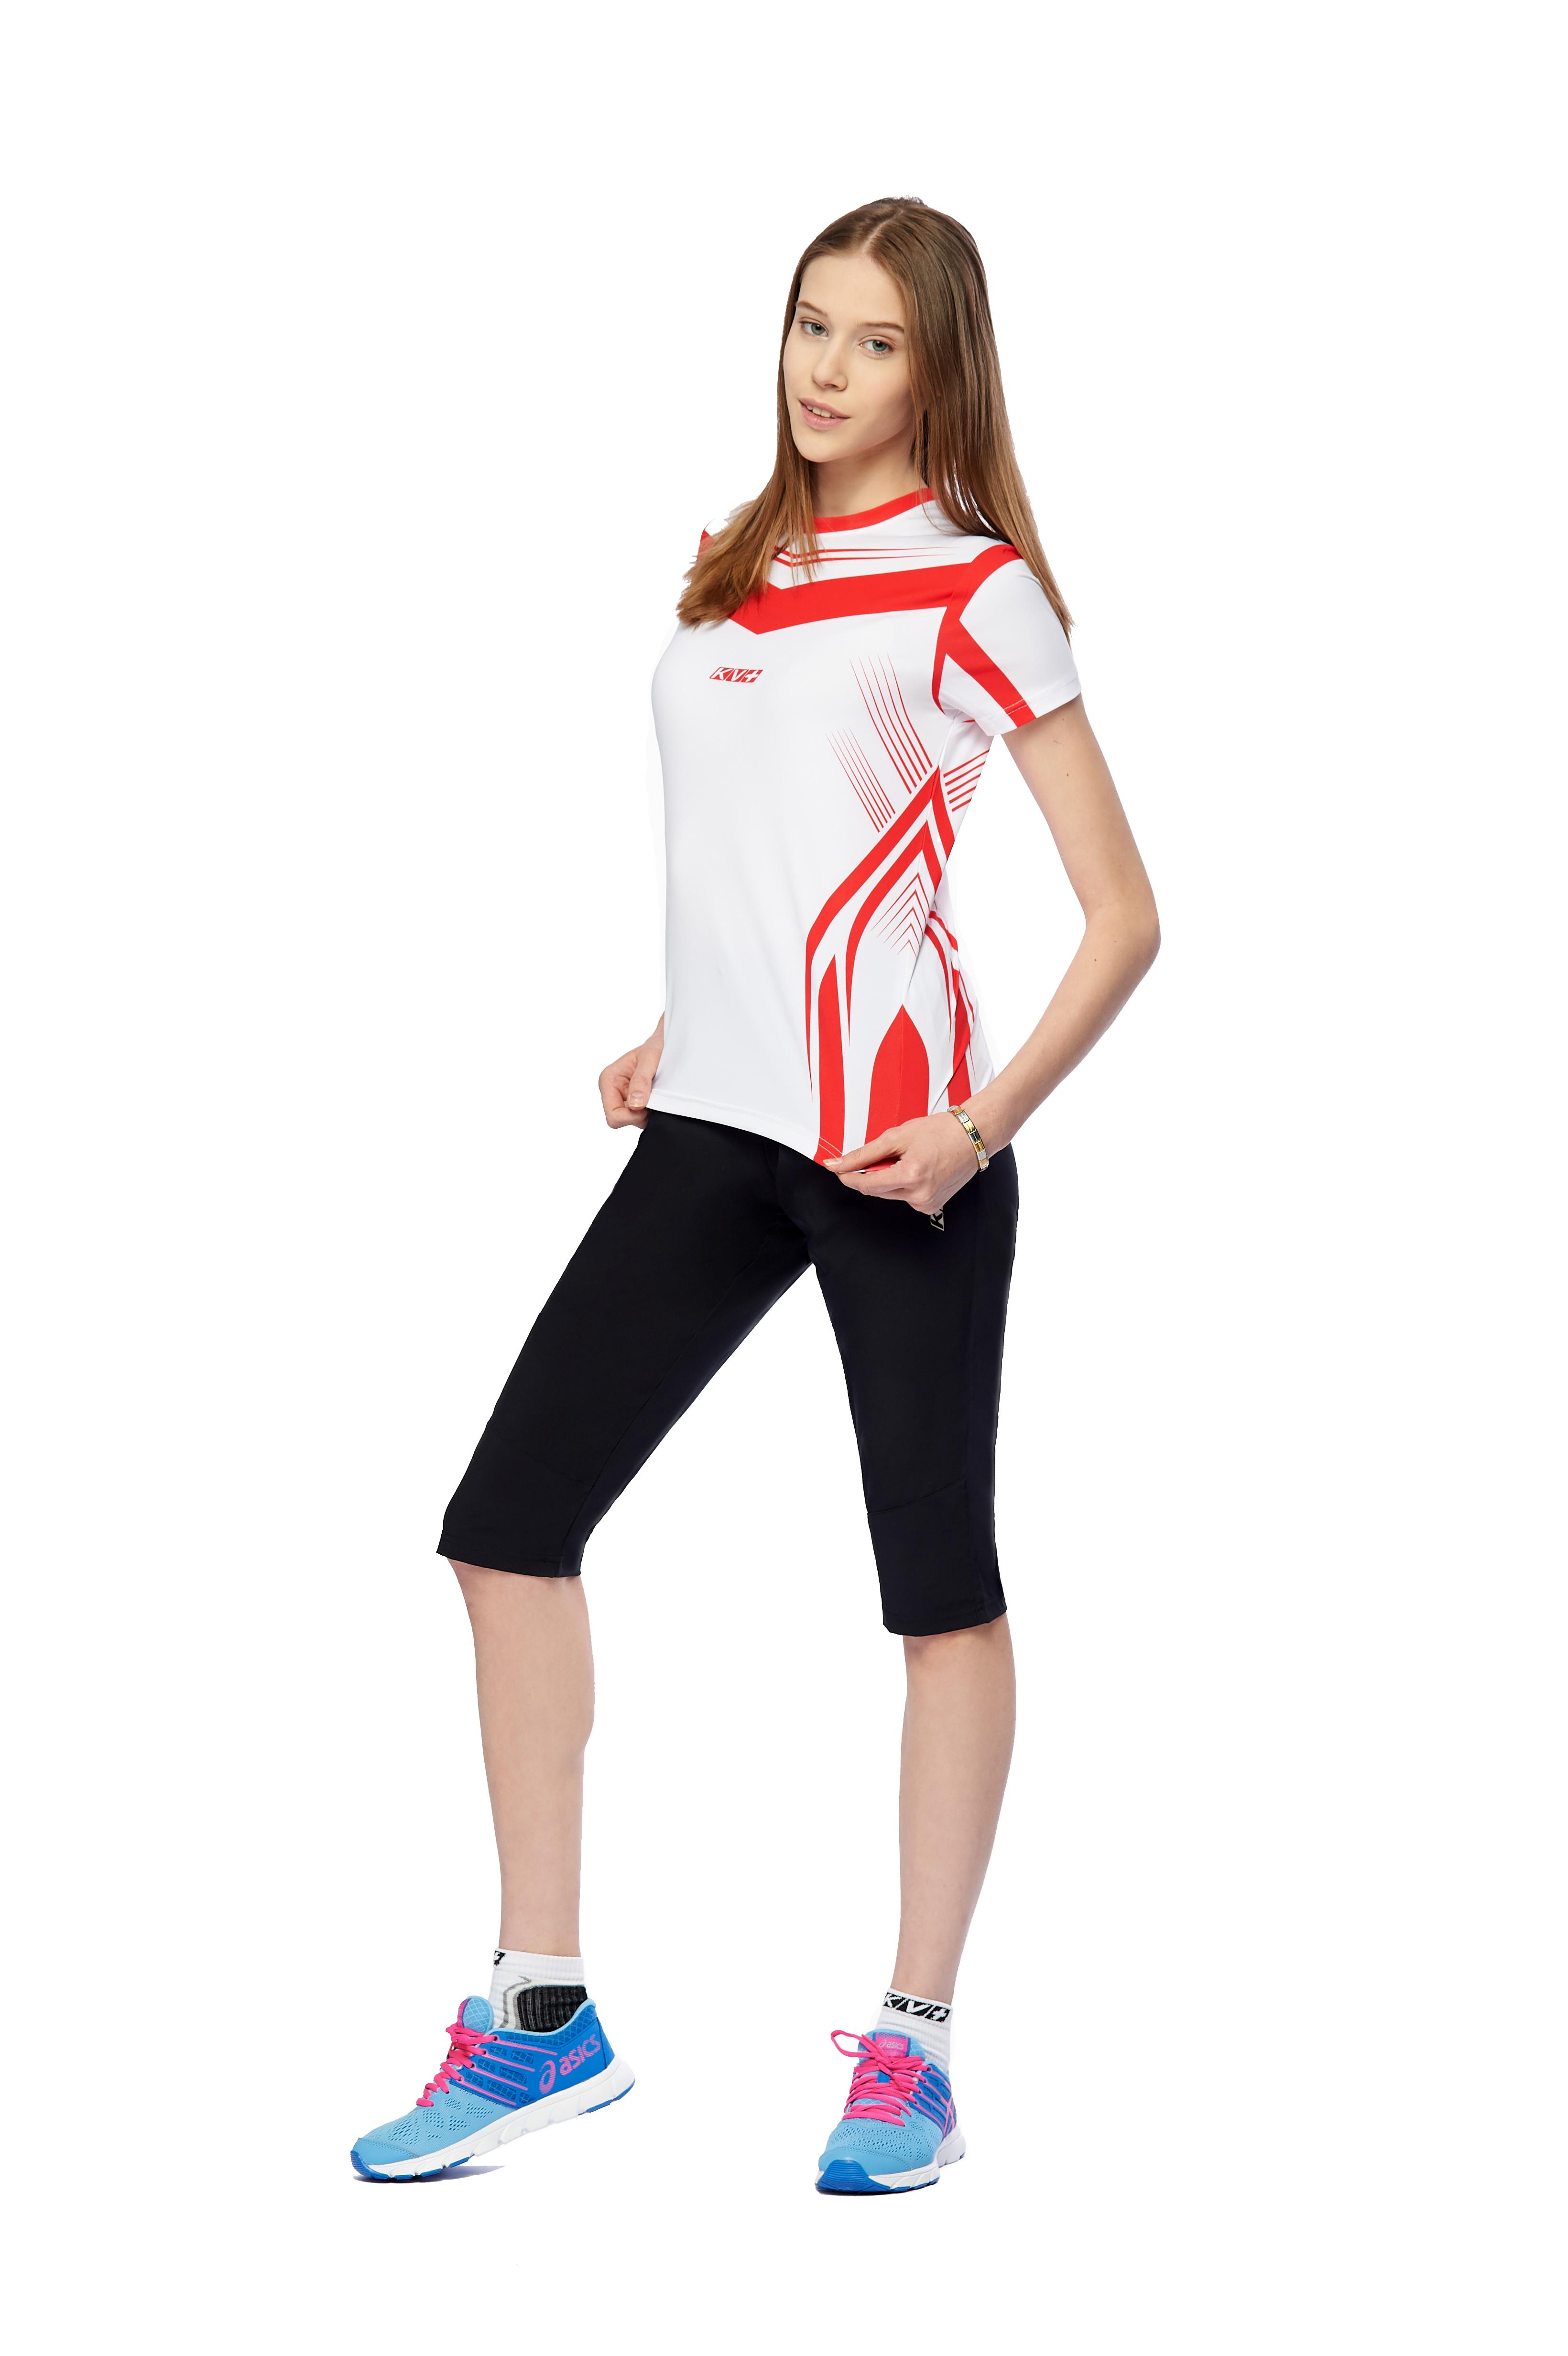 SPRINT T-SHIRT UNISEX (red)